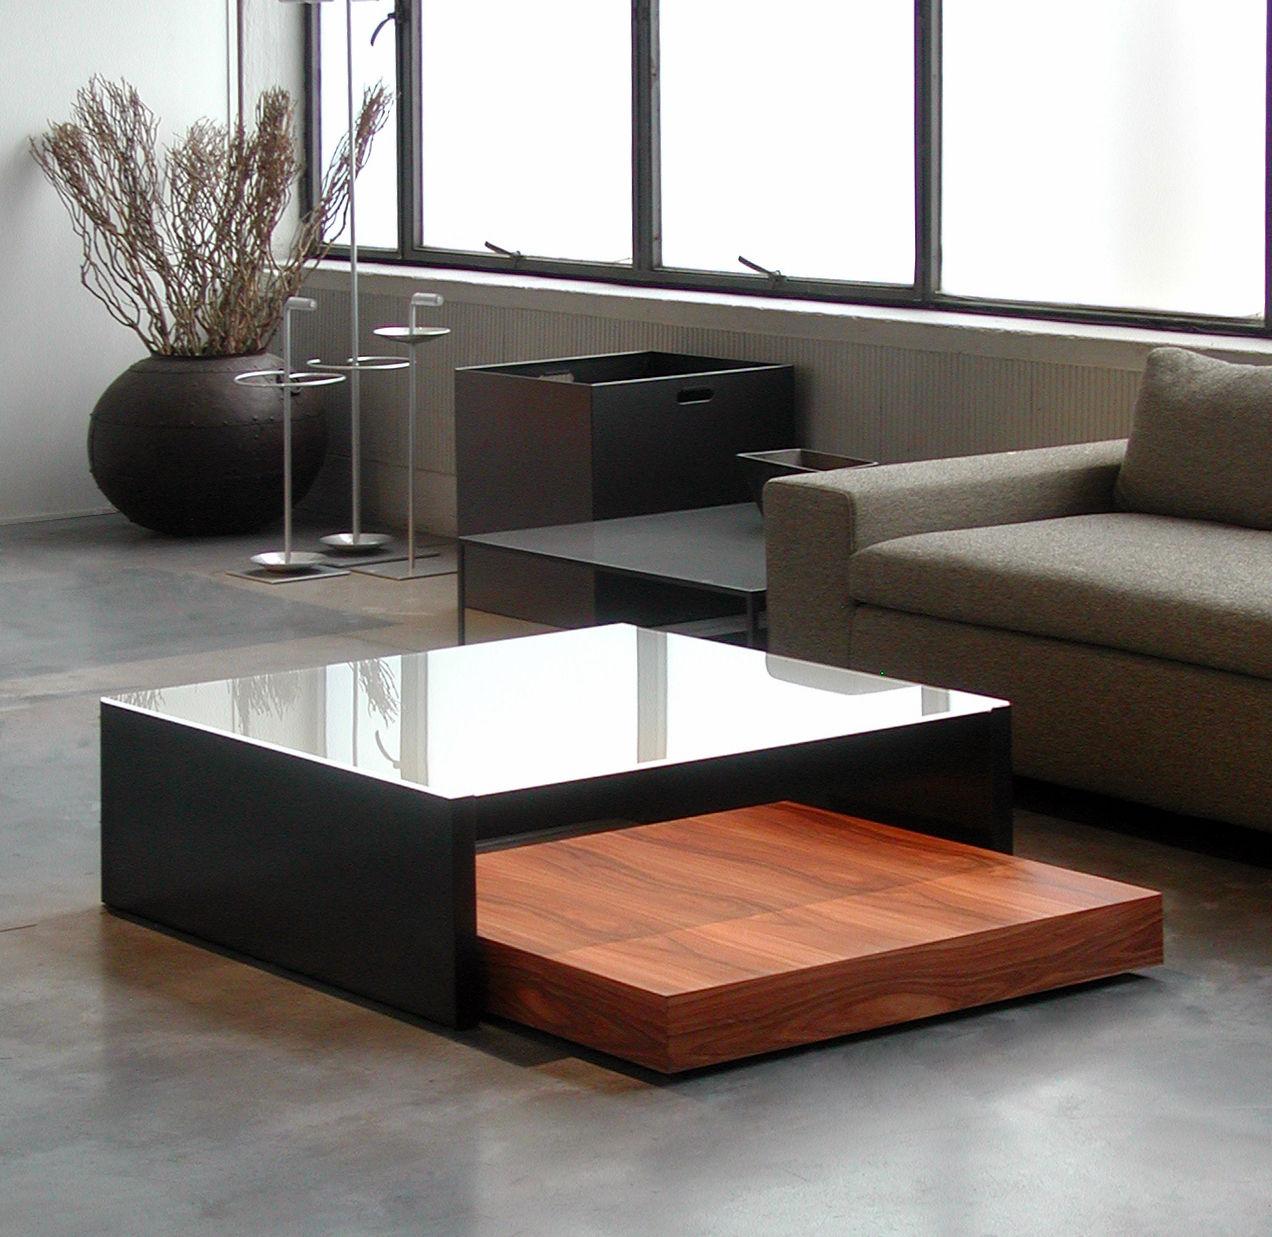 Table basse fred wilma verre acidifi acier noir for Table basse acier noir